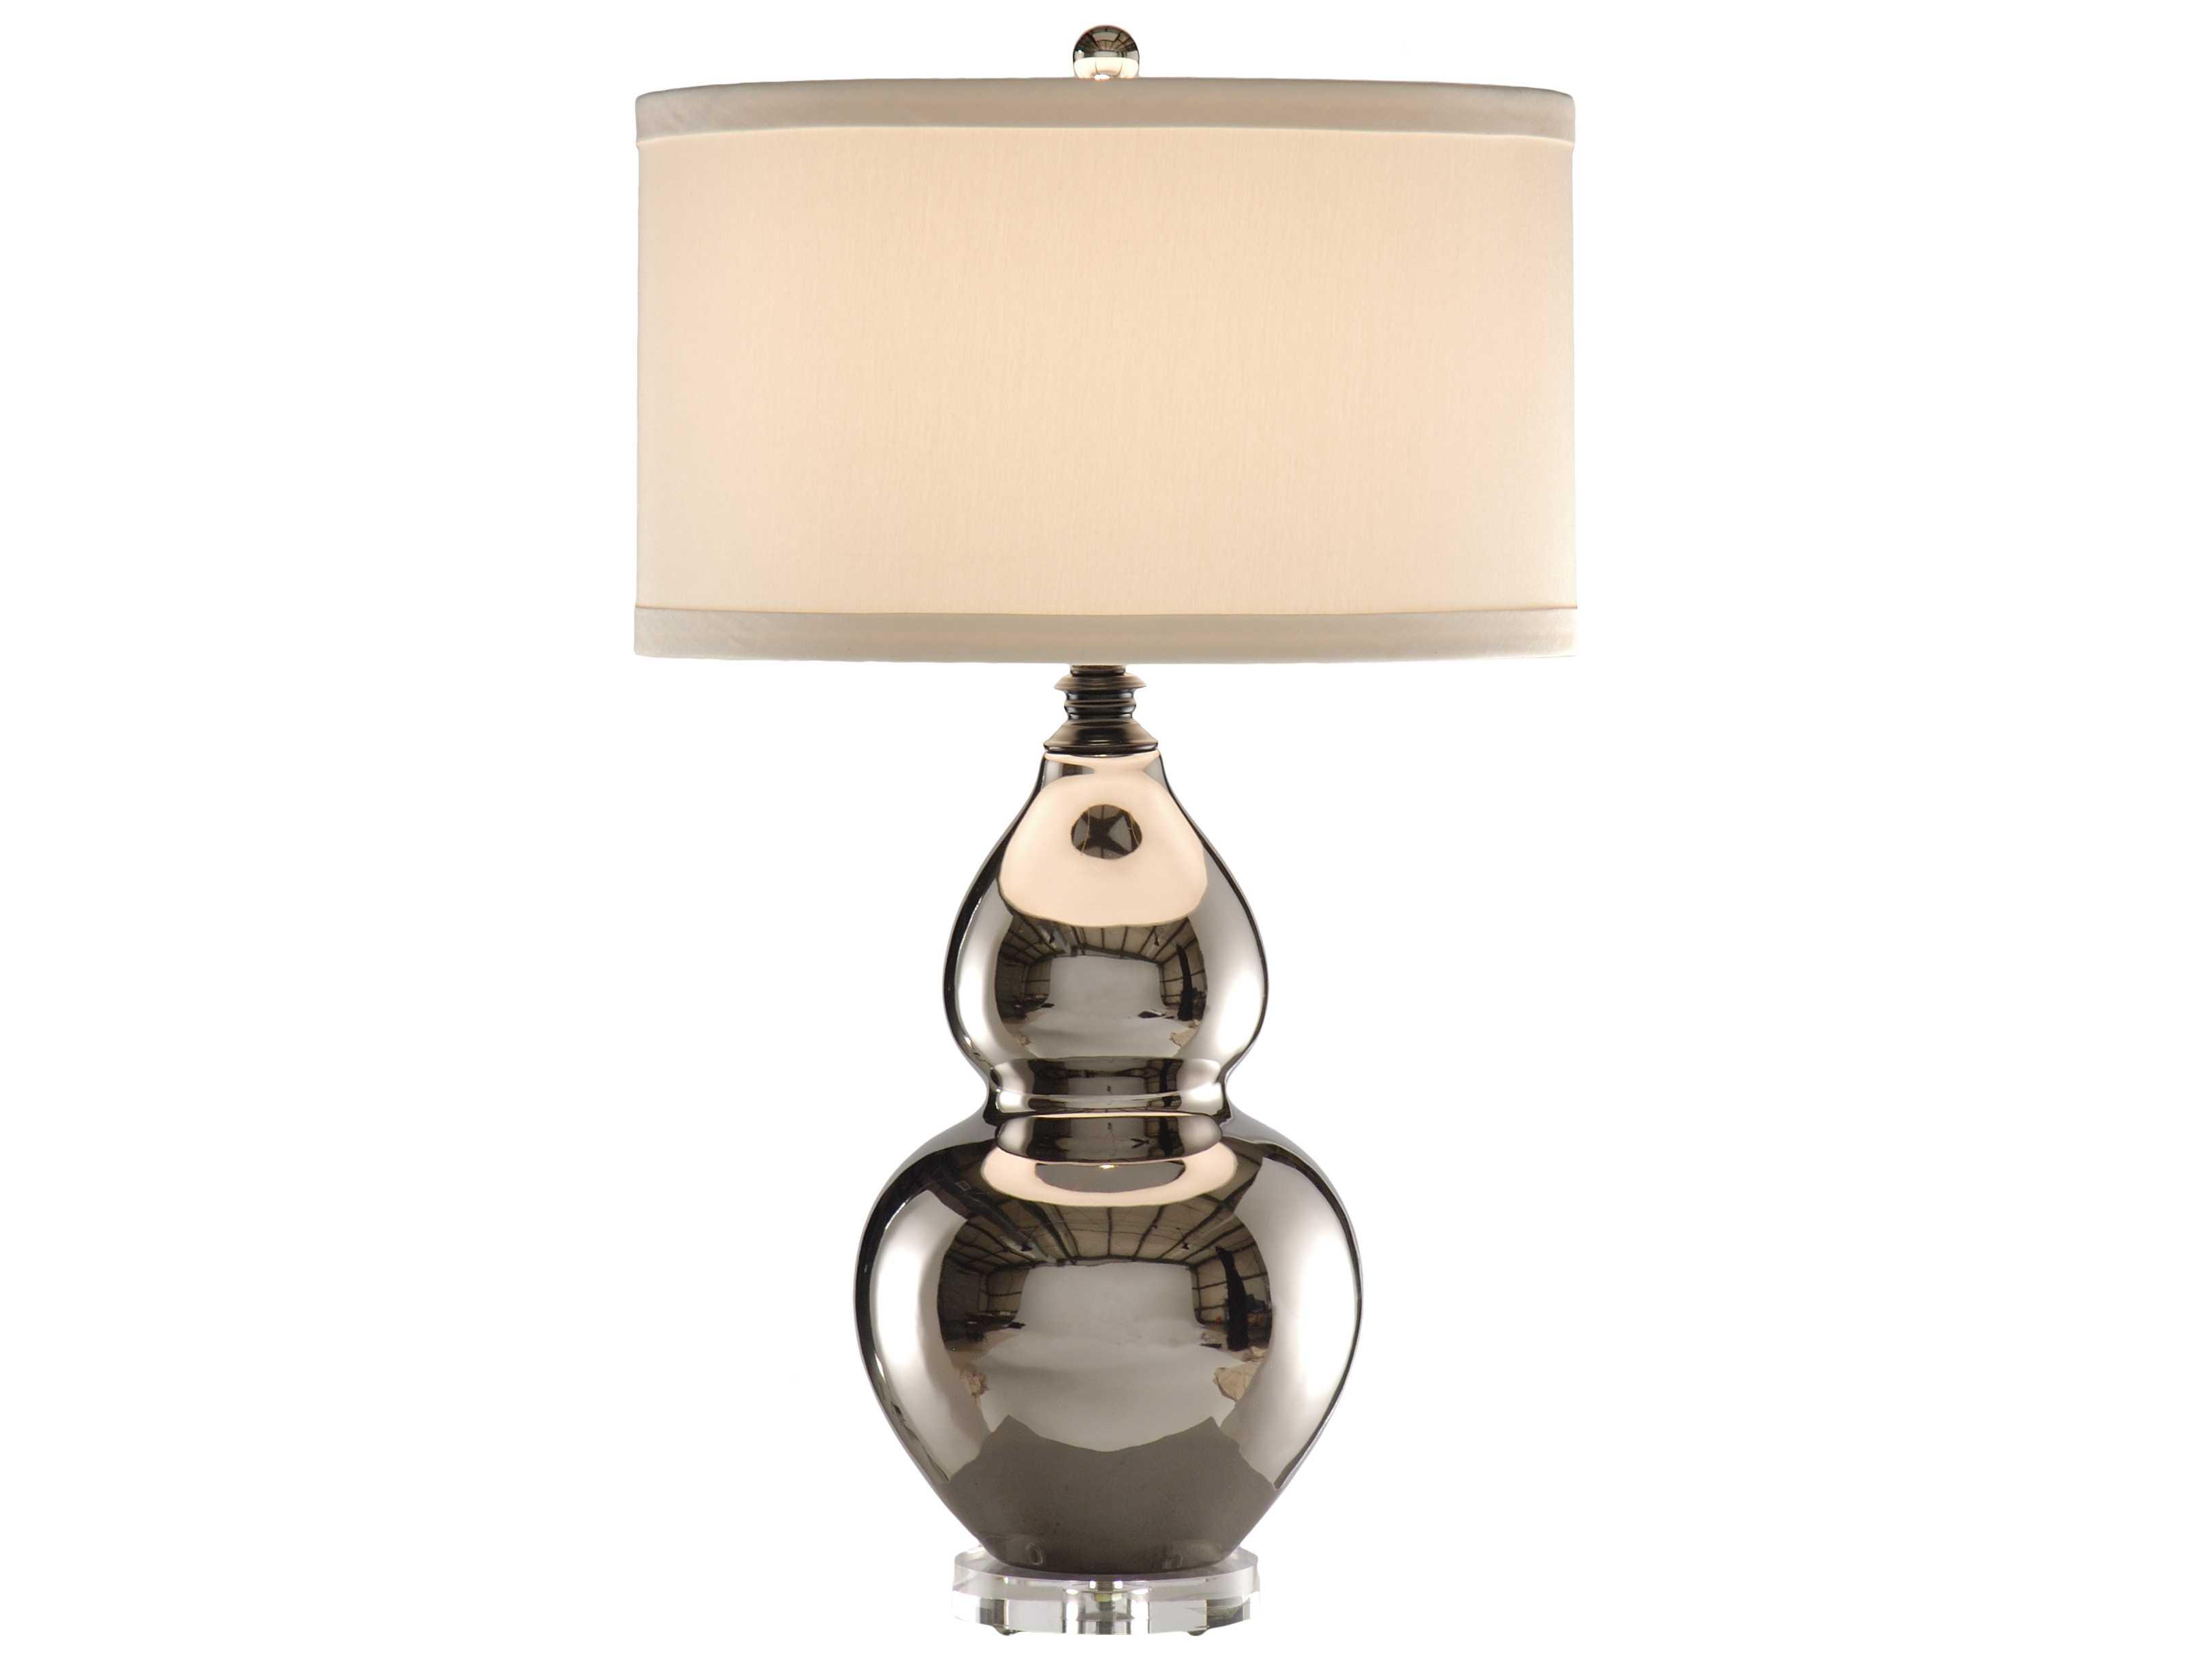 lamps ceramic metallic silver gourd acrylic base shiny table lamp. Black Bedroom Furniture Sets. Home Design Ideas